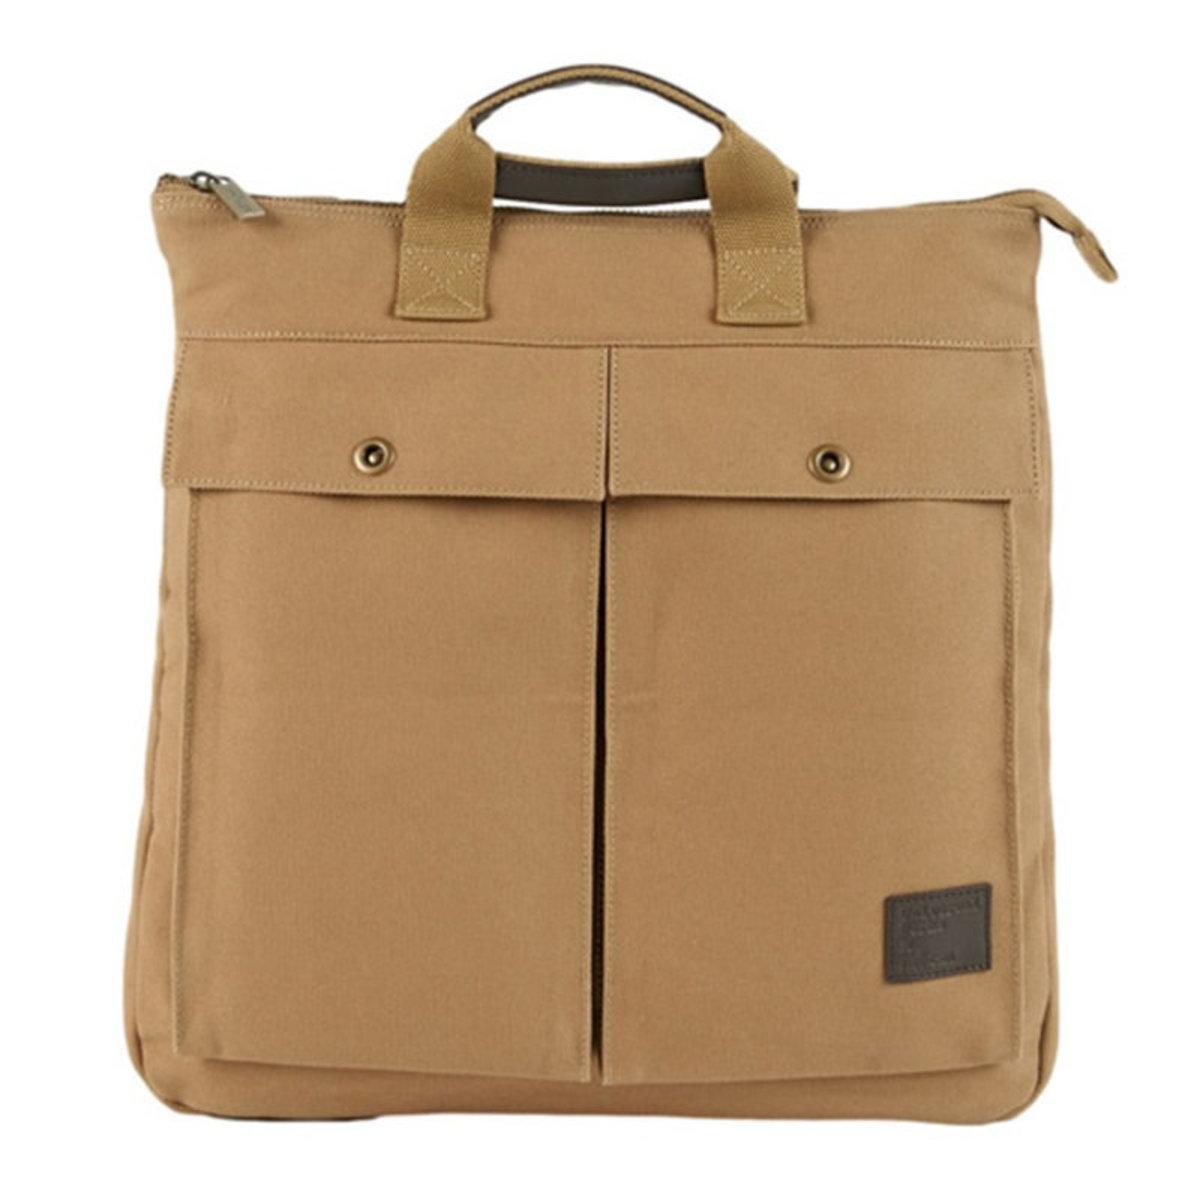 George The Crew Bag (13L)